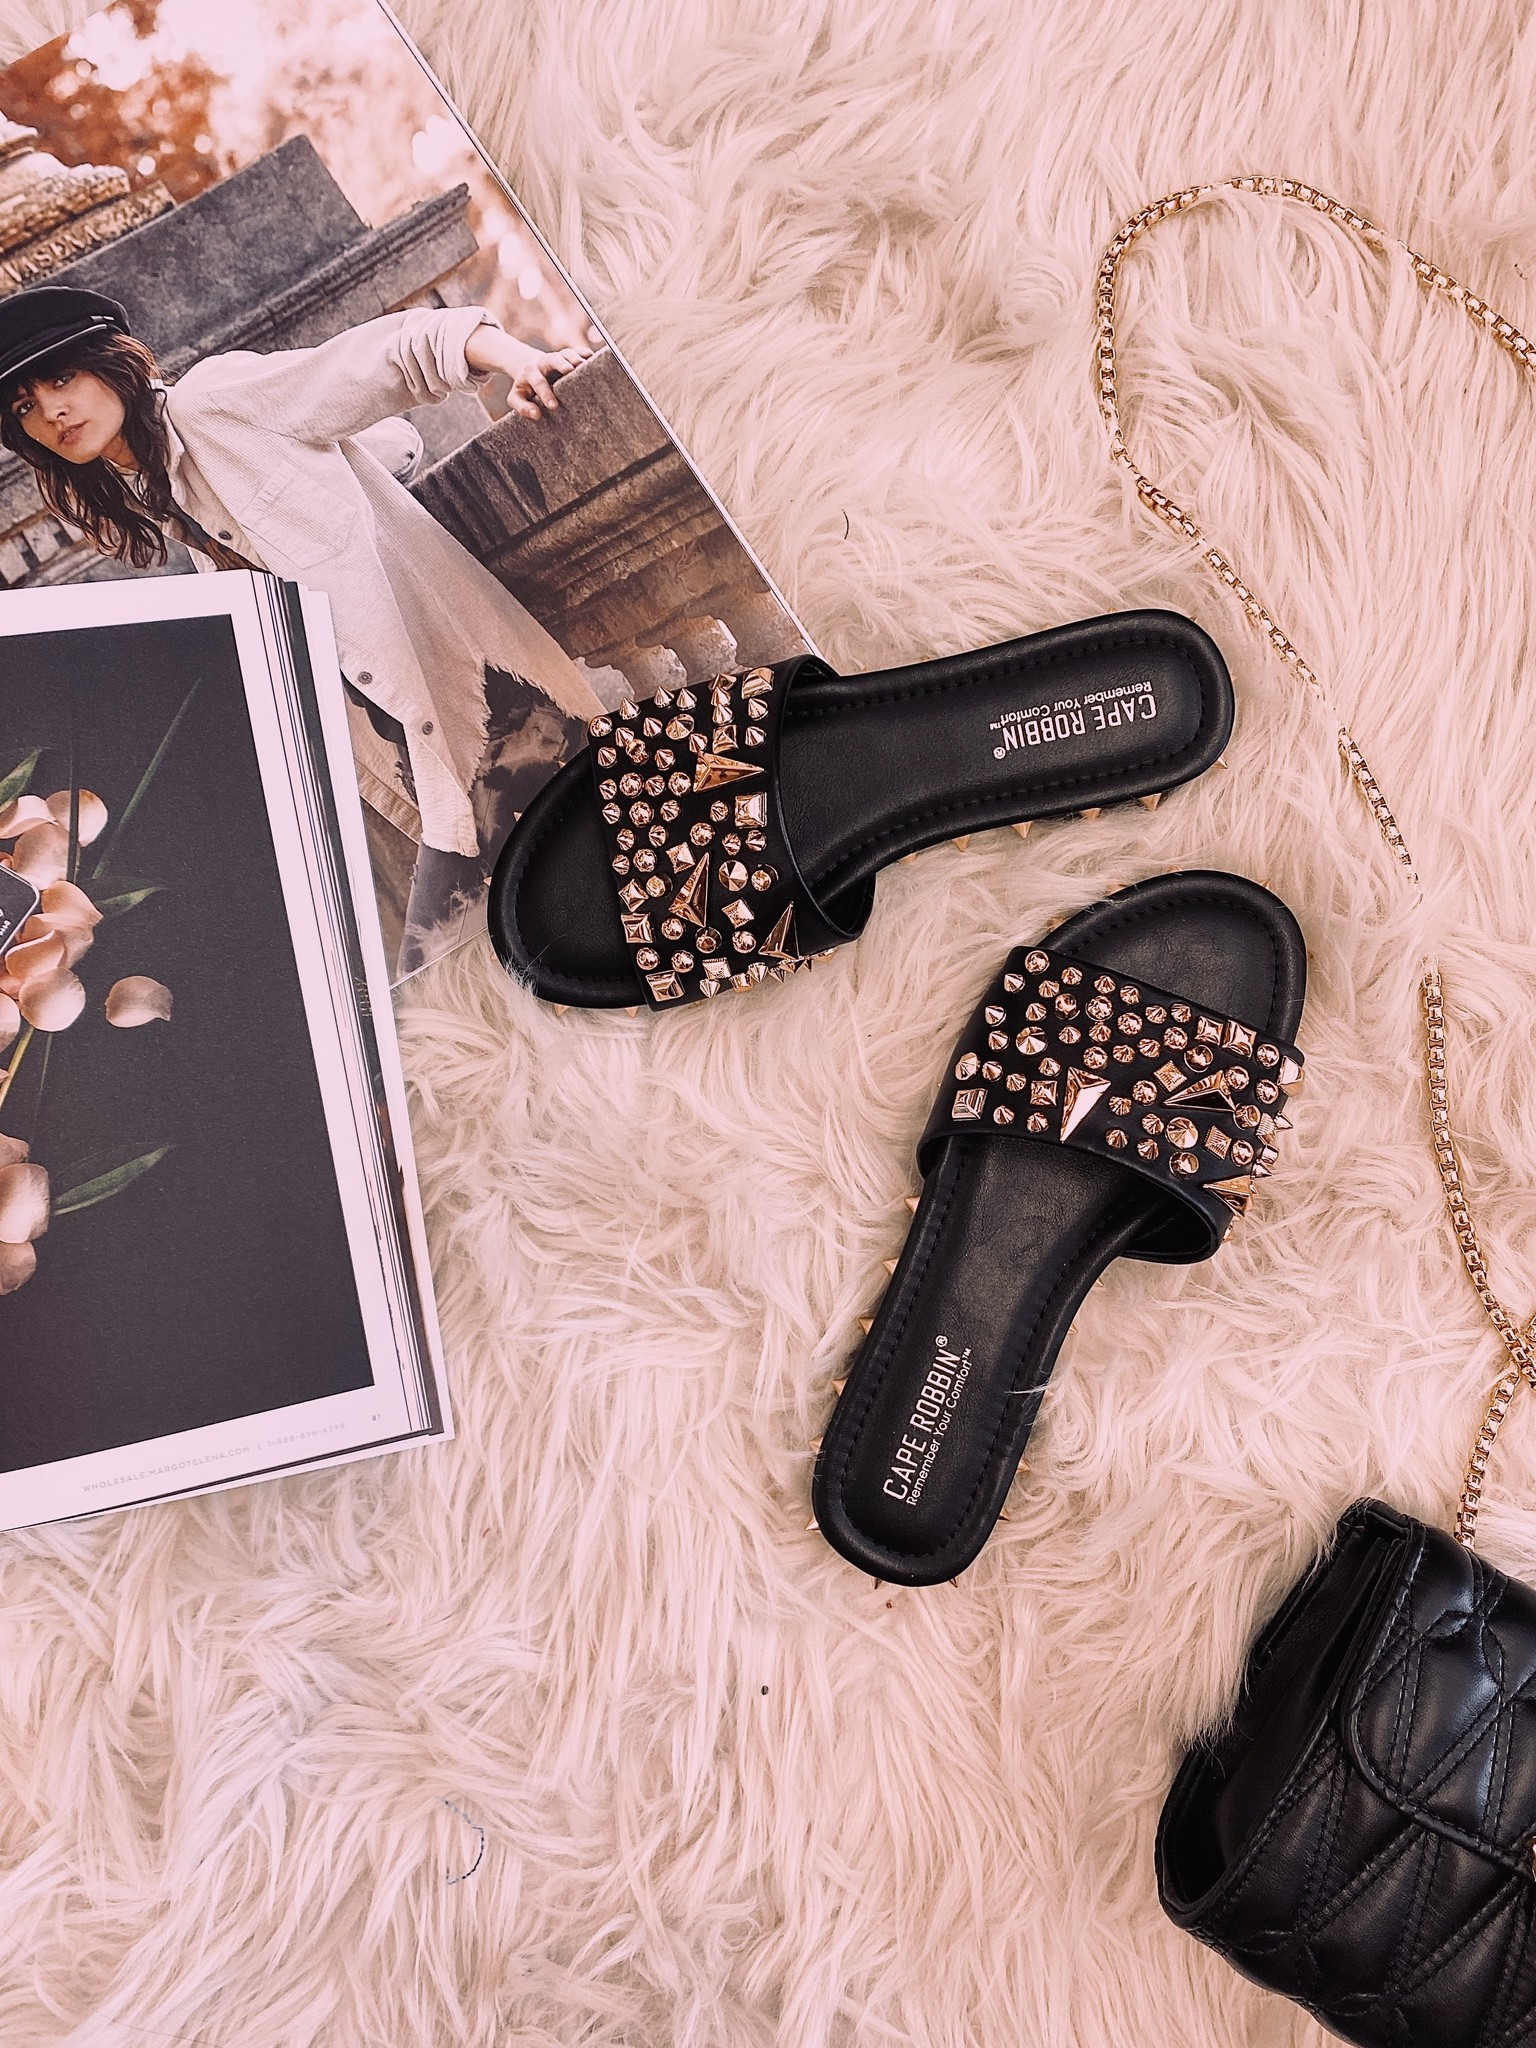 Trisha Studded Black Slipon